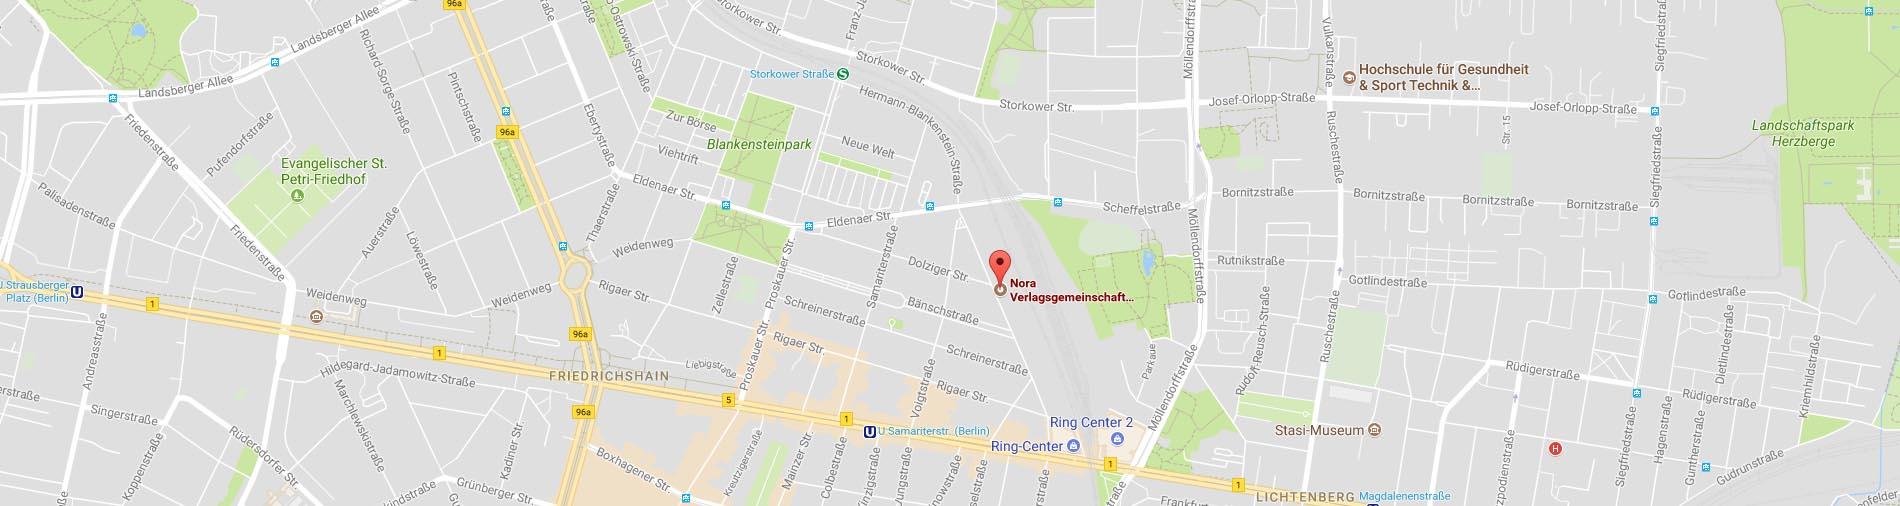 buchverlag-berlin-maps